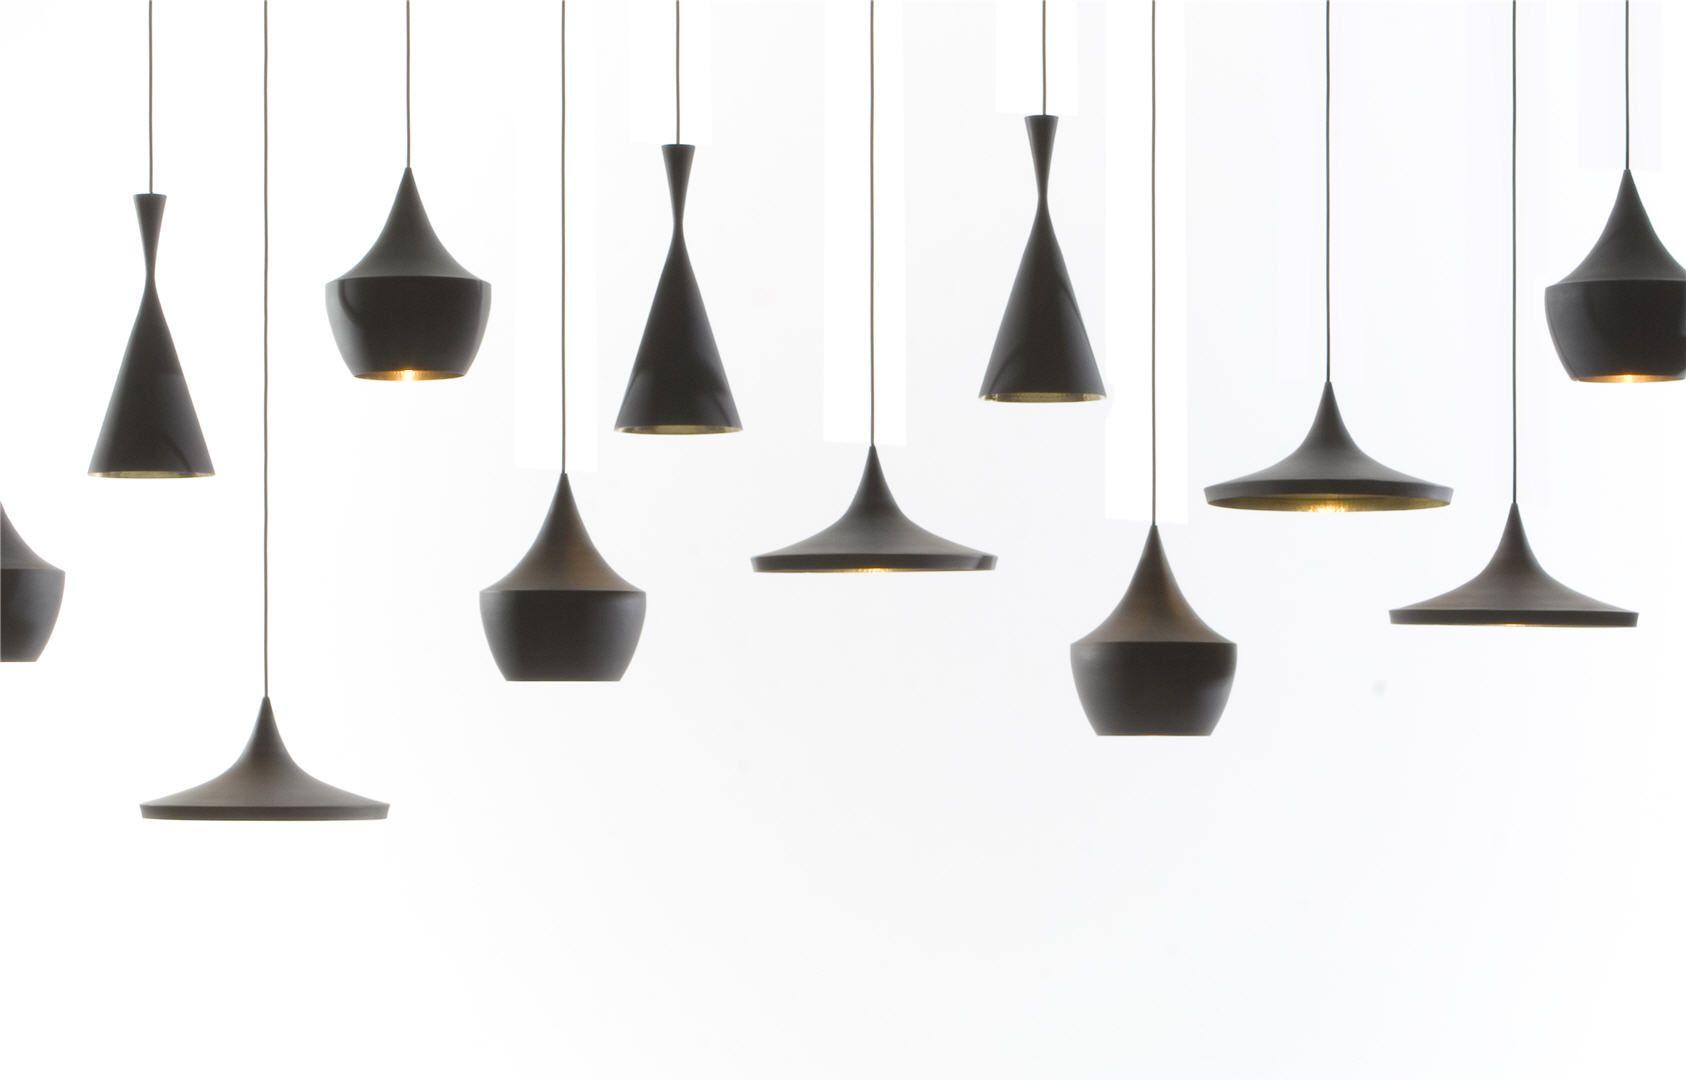 design classic lighting. Tom Dixon Lighting - Google Search Design Classic